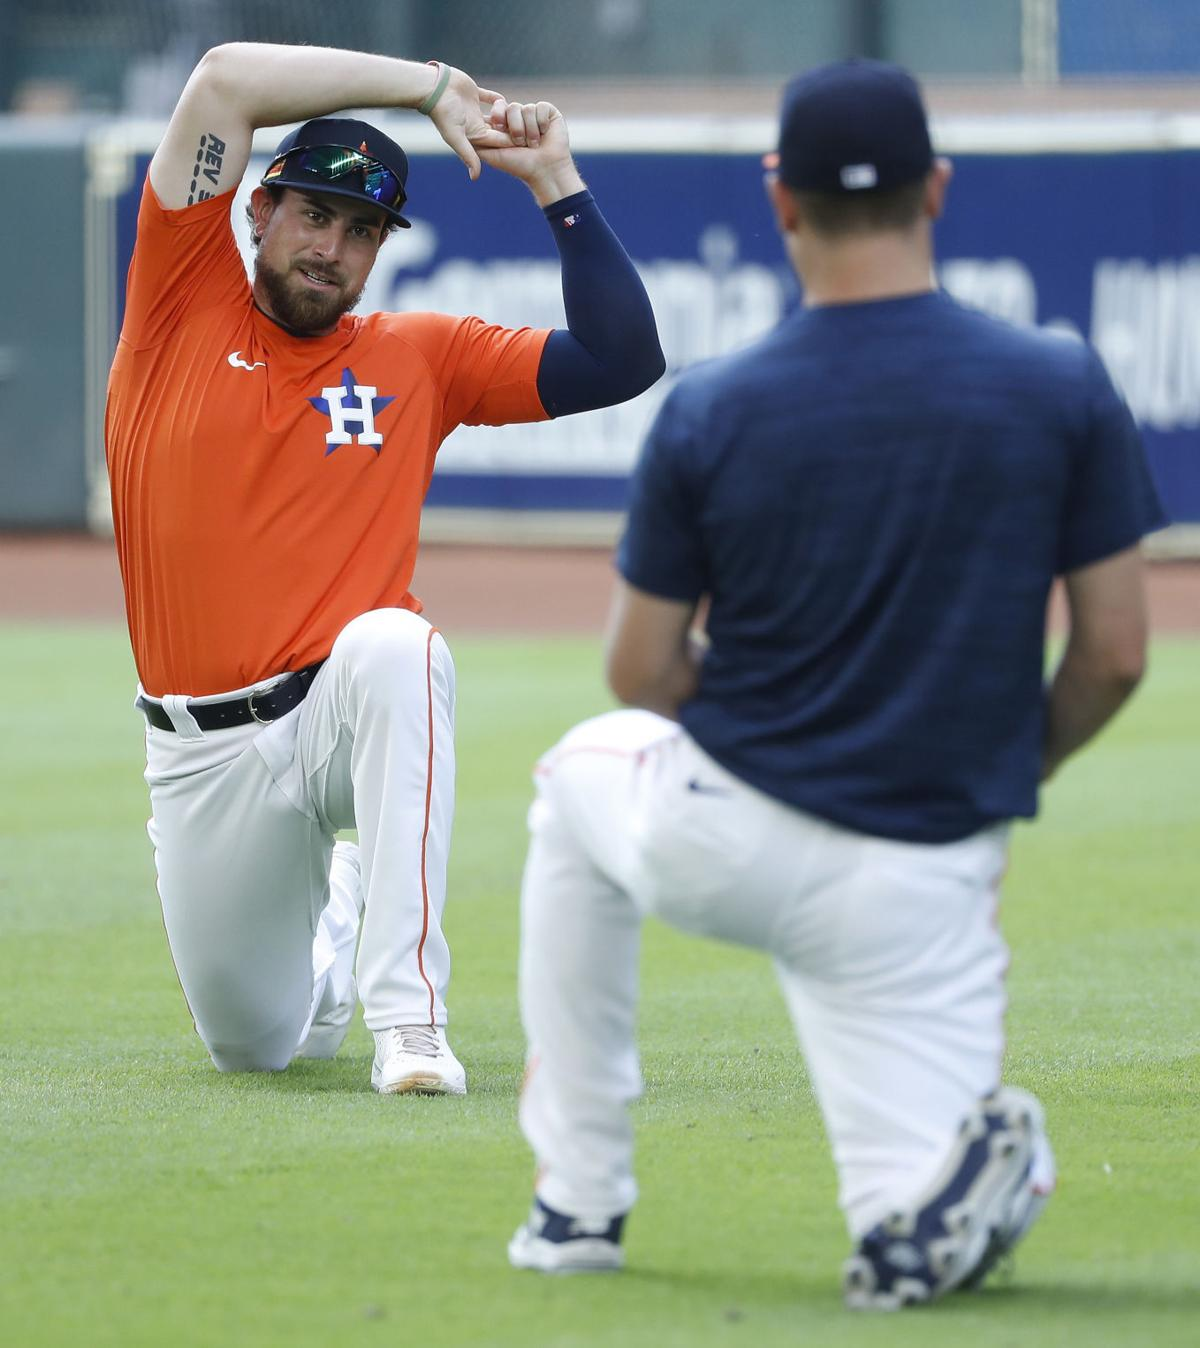 Houston Astros vs. Detriot Tigers